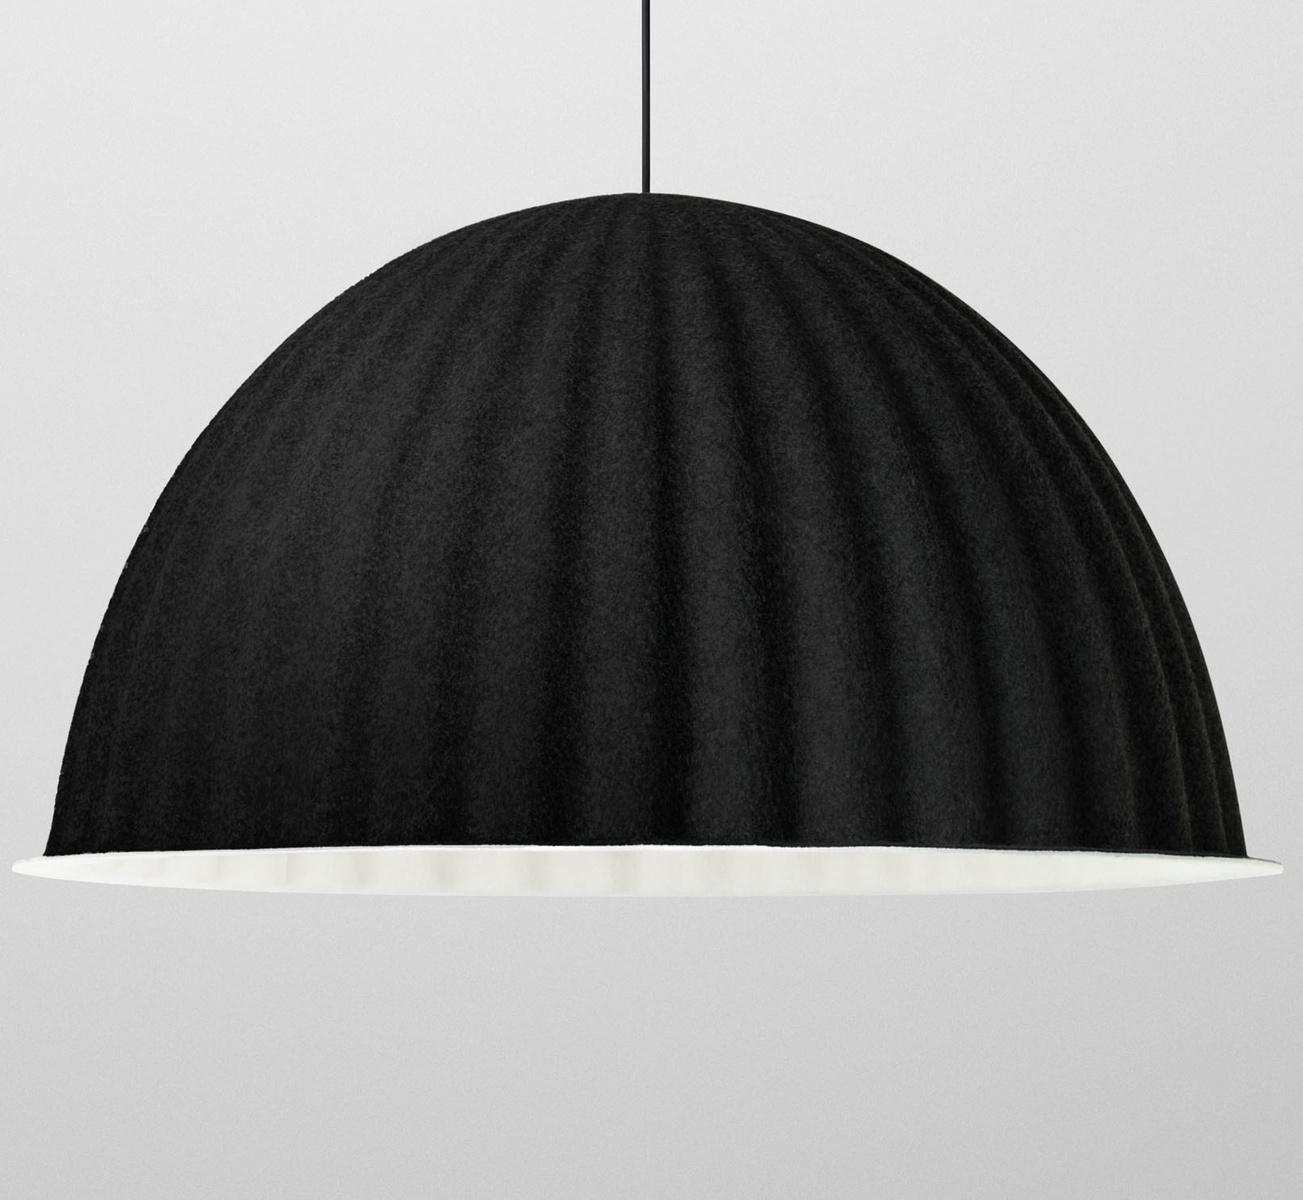 Muuto Závesná lampa Under The Bell 82 cm, čierna